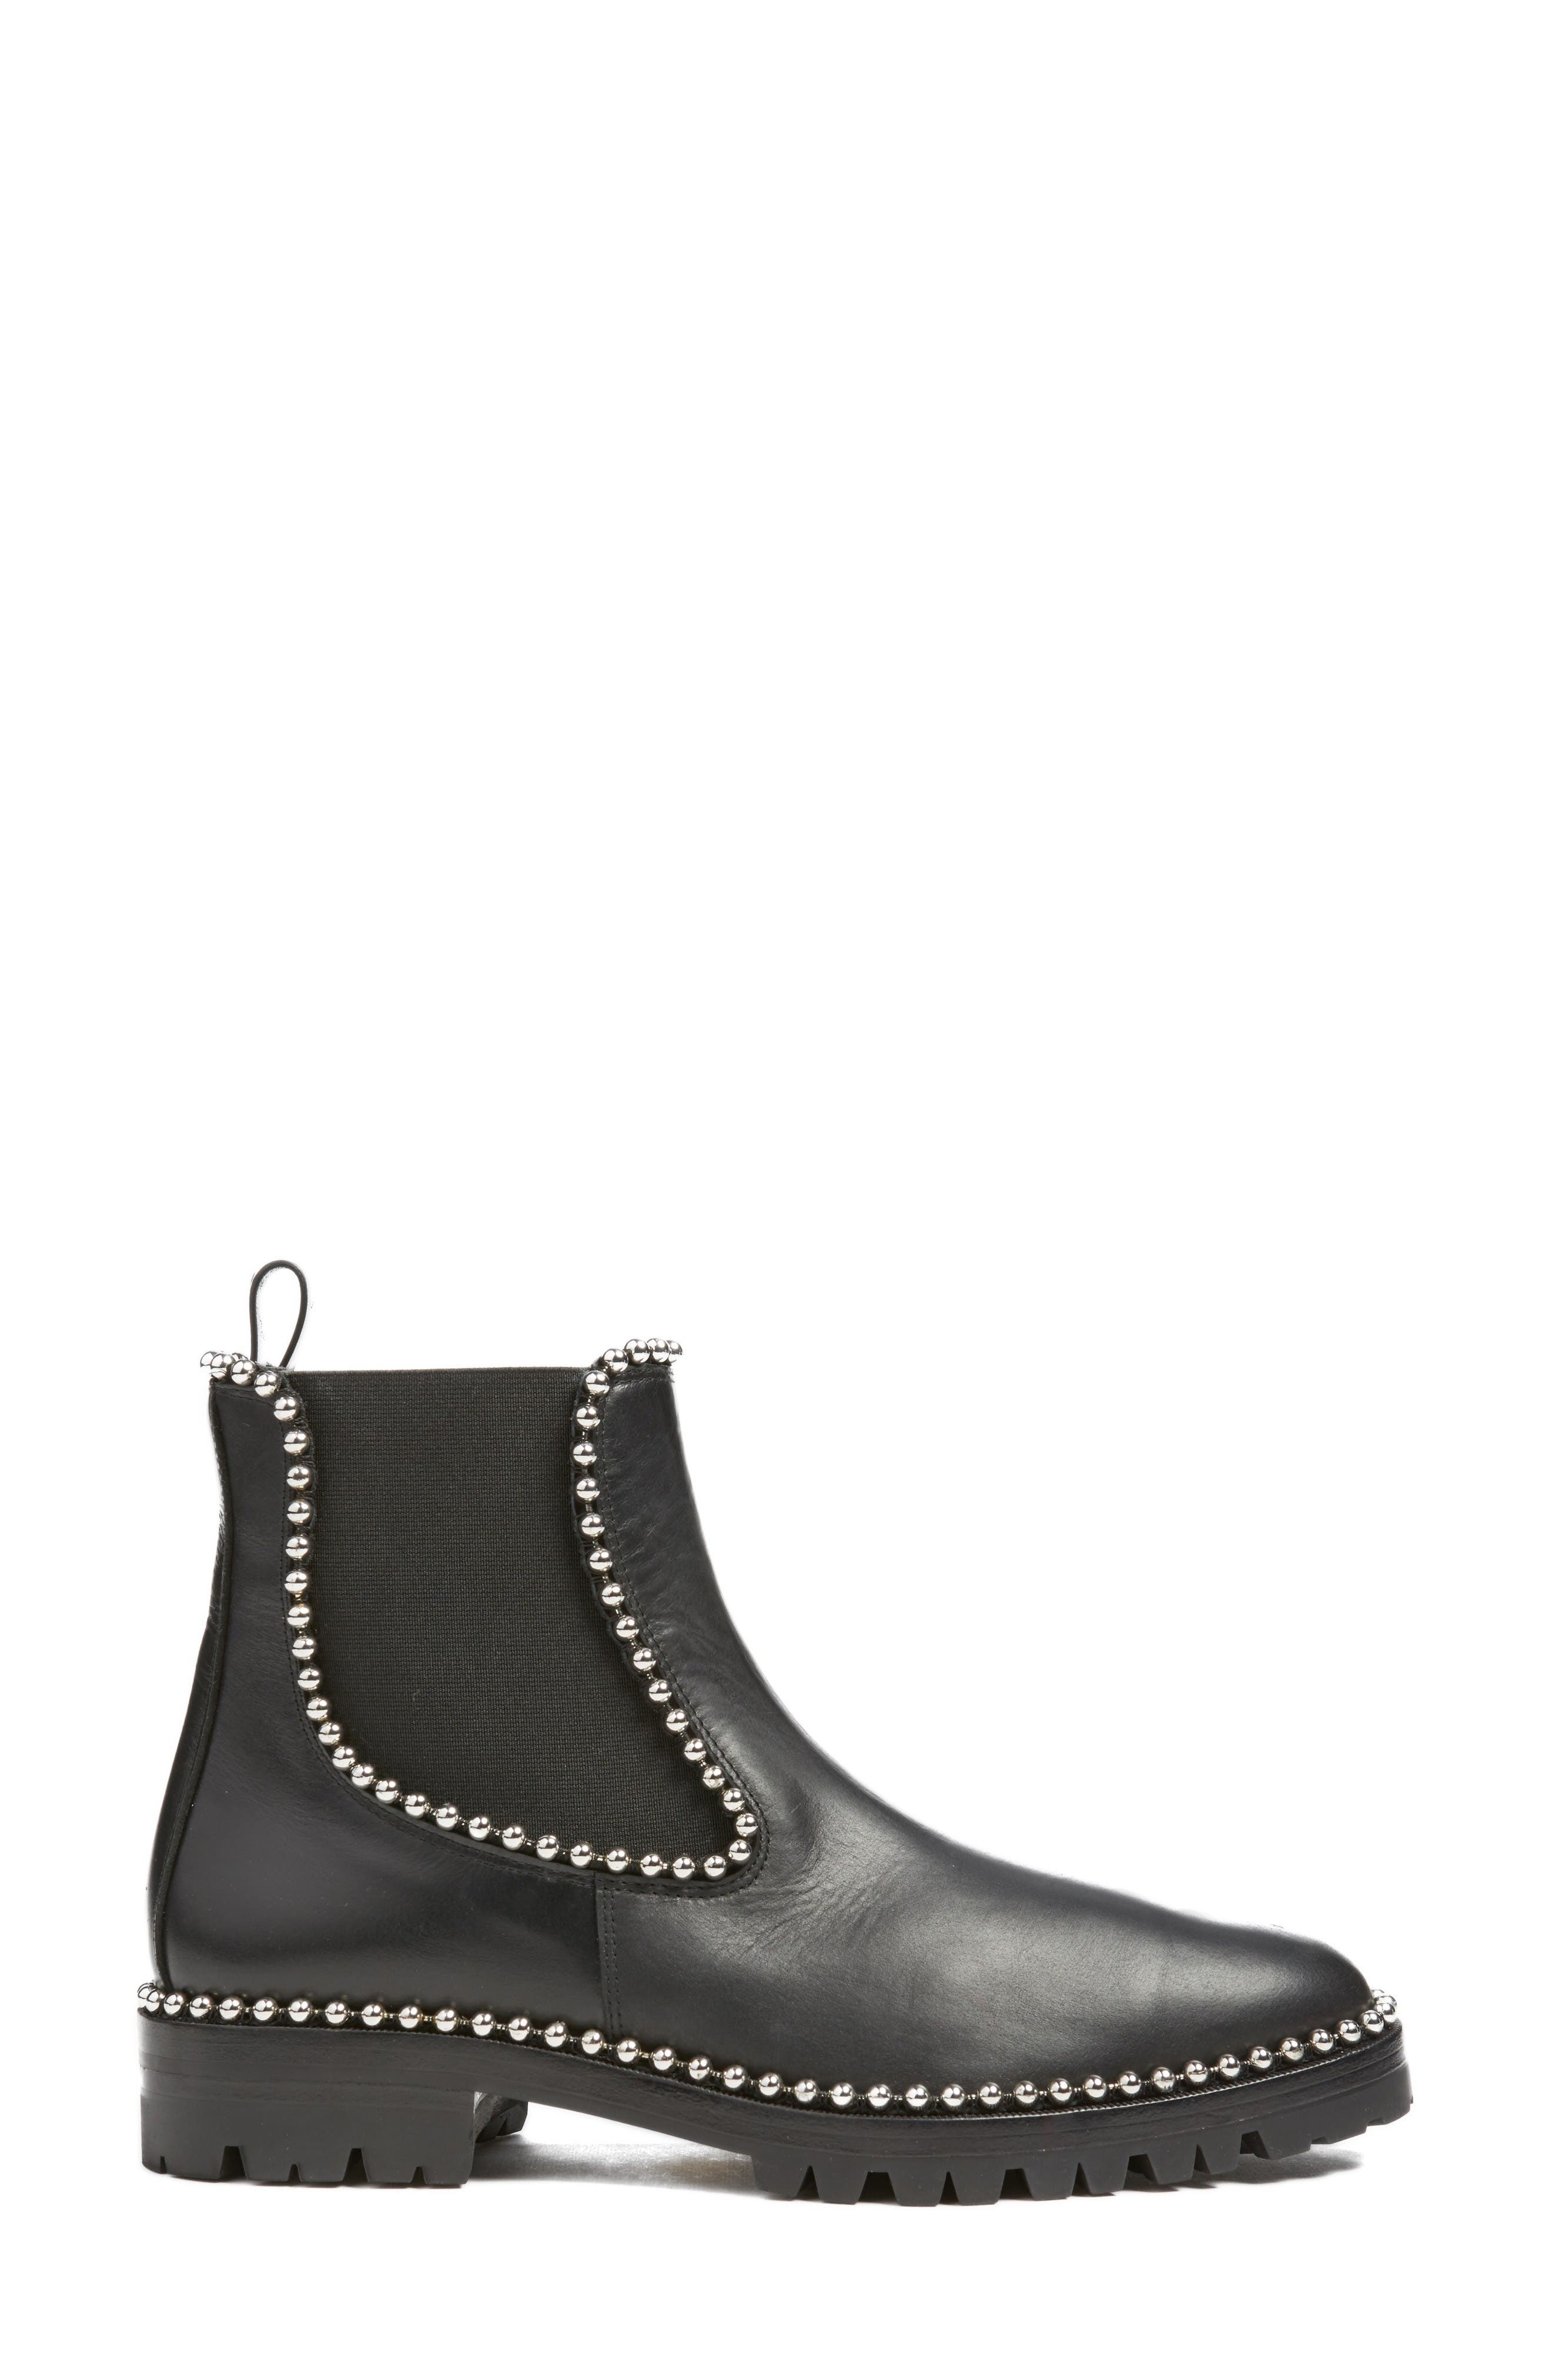 Spencer Chelsea Boot,                             Alternate thumbnail 3, color,                             Black Leather